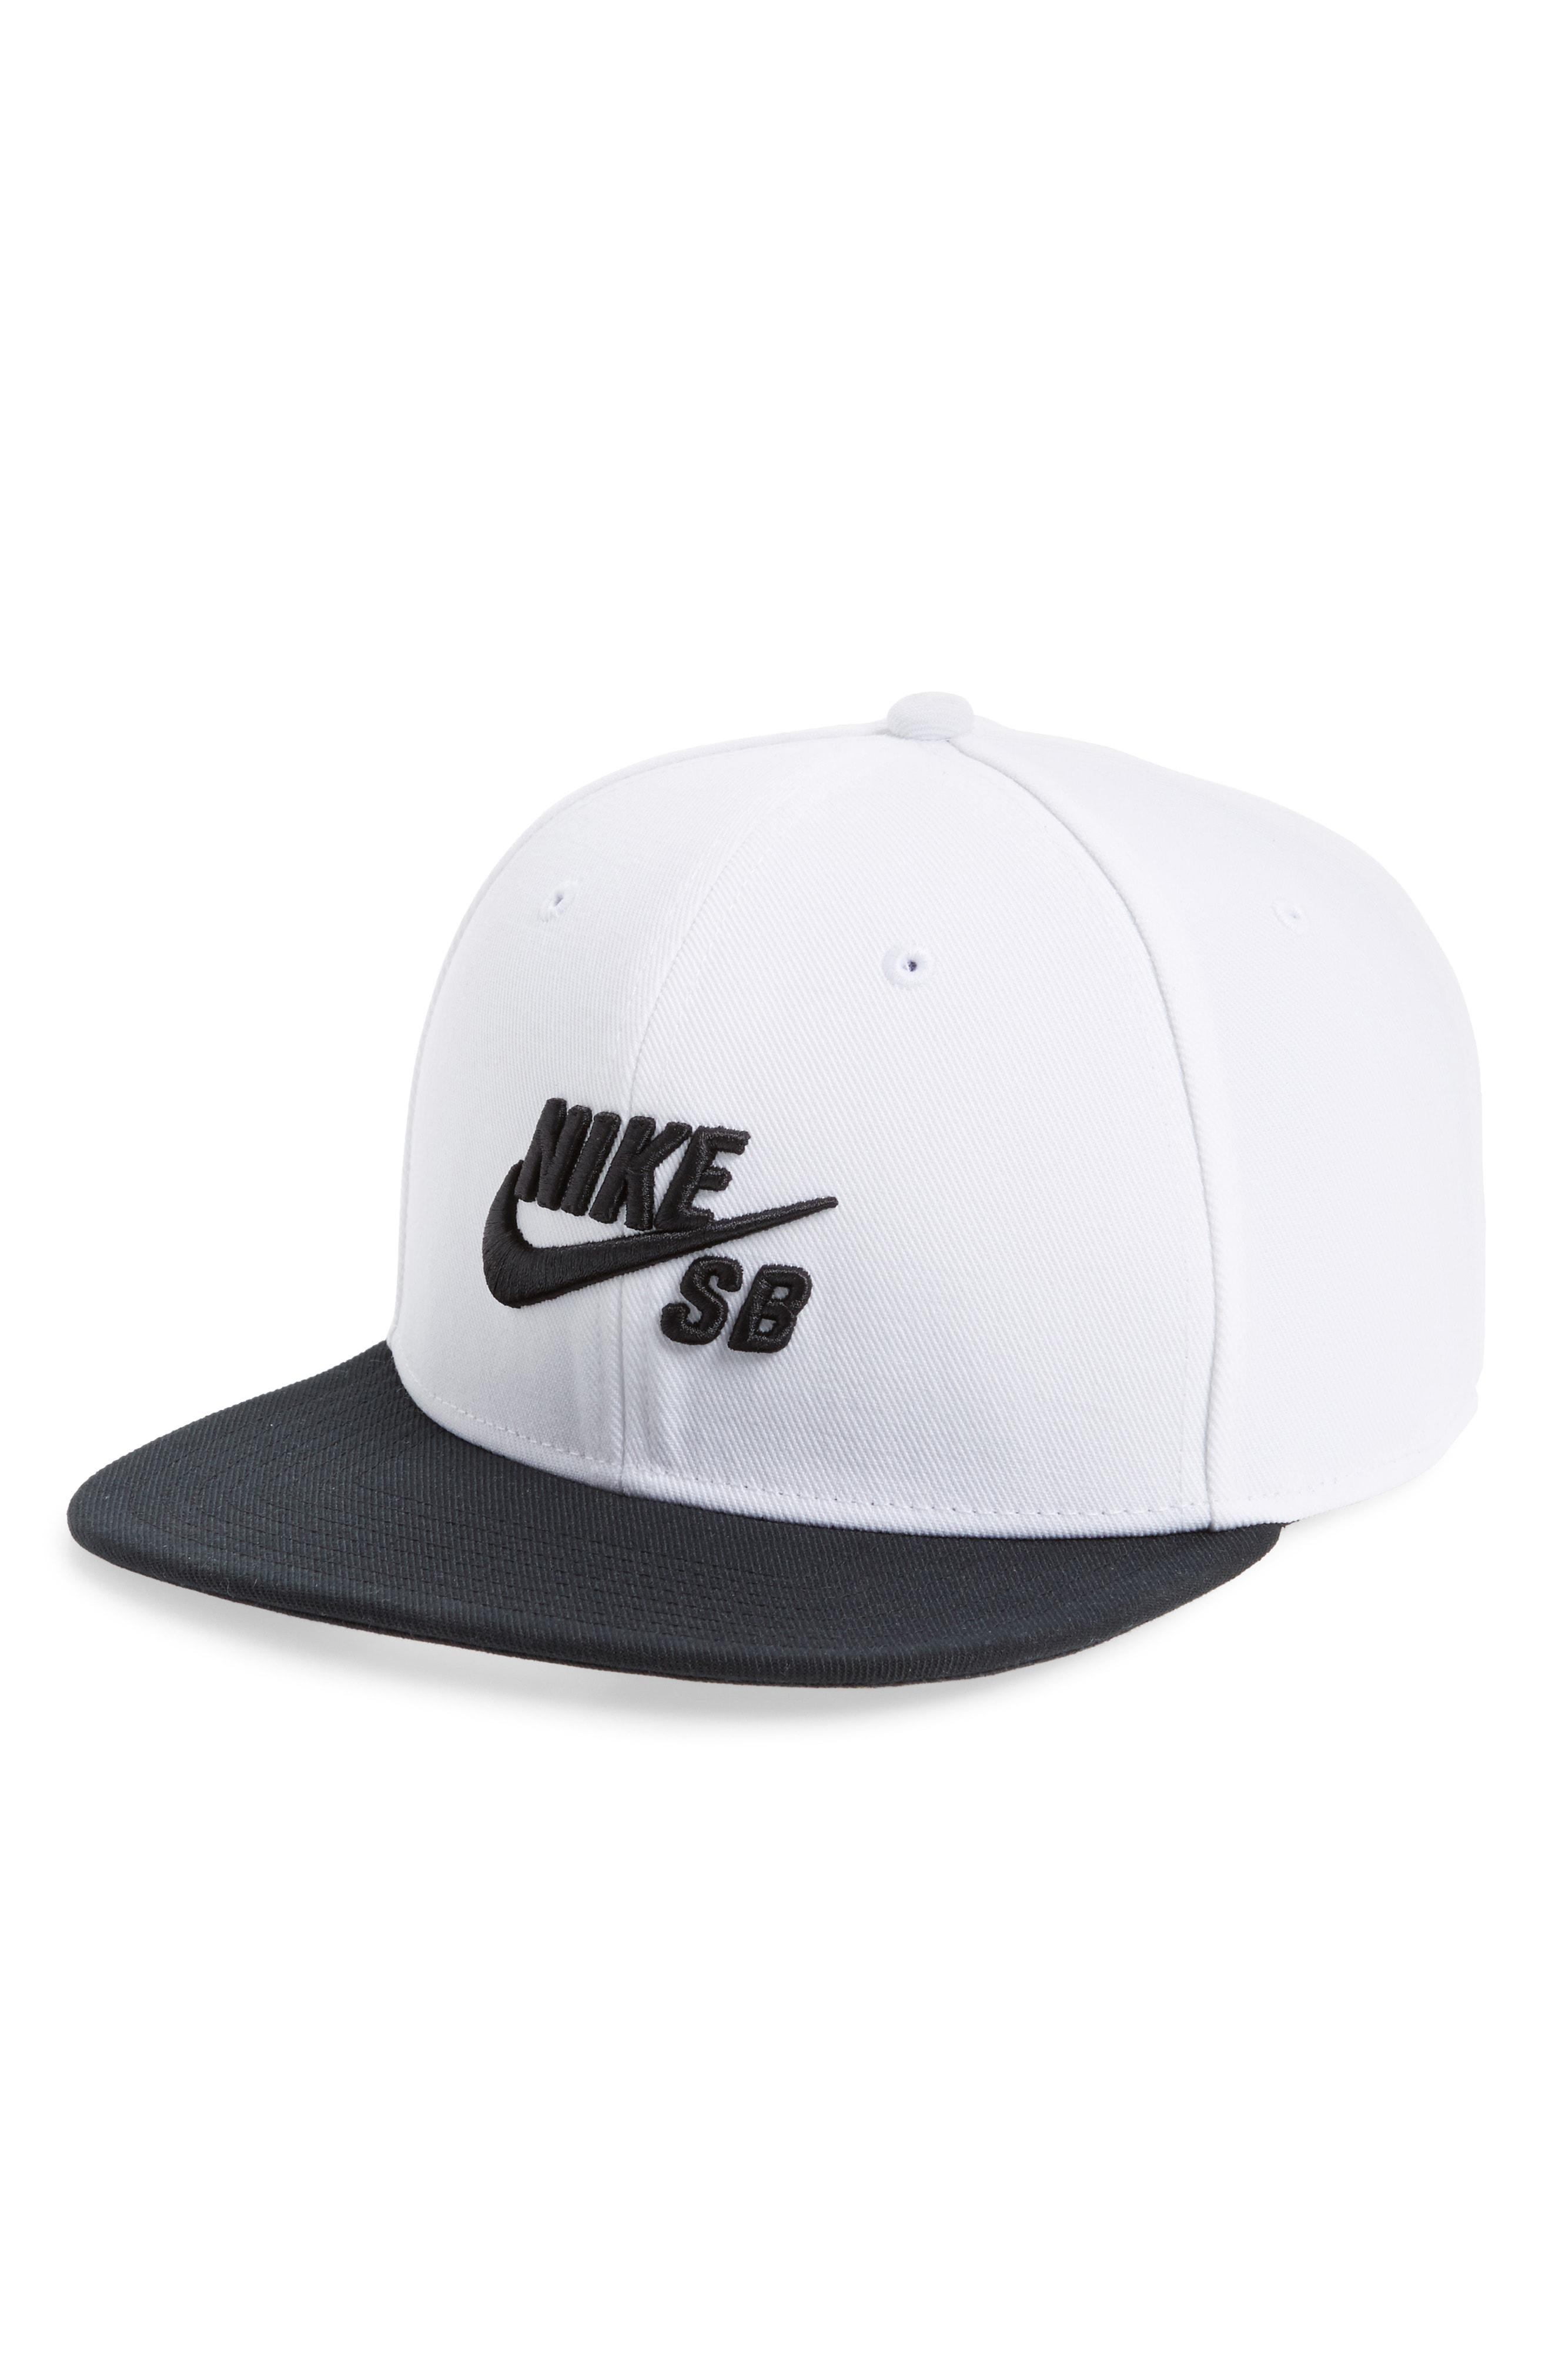 ac1672c02fa8 Lyst - Nike Nike Pro Snapback Baseball Cap in Black for Men